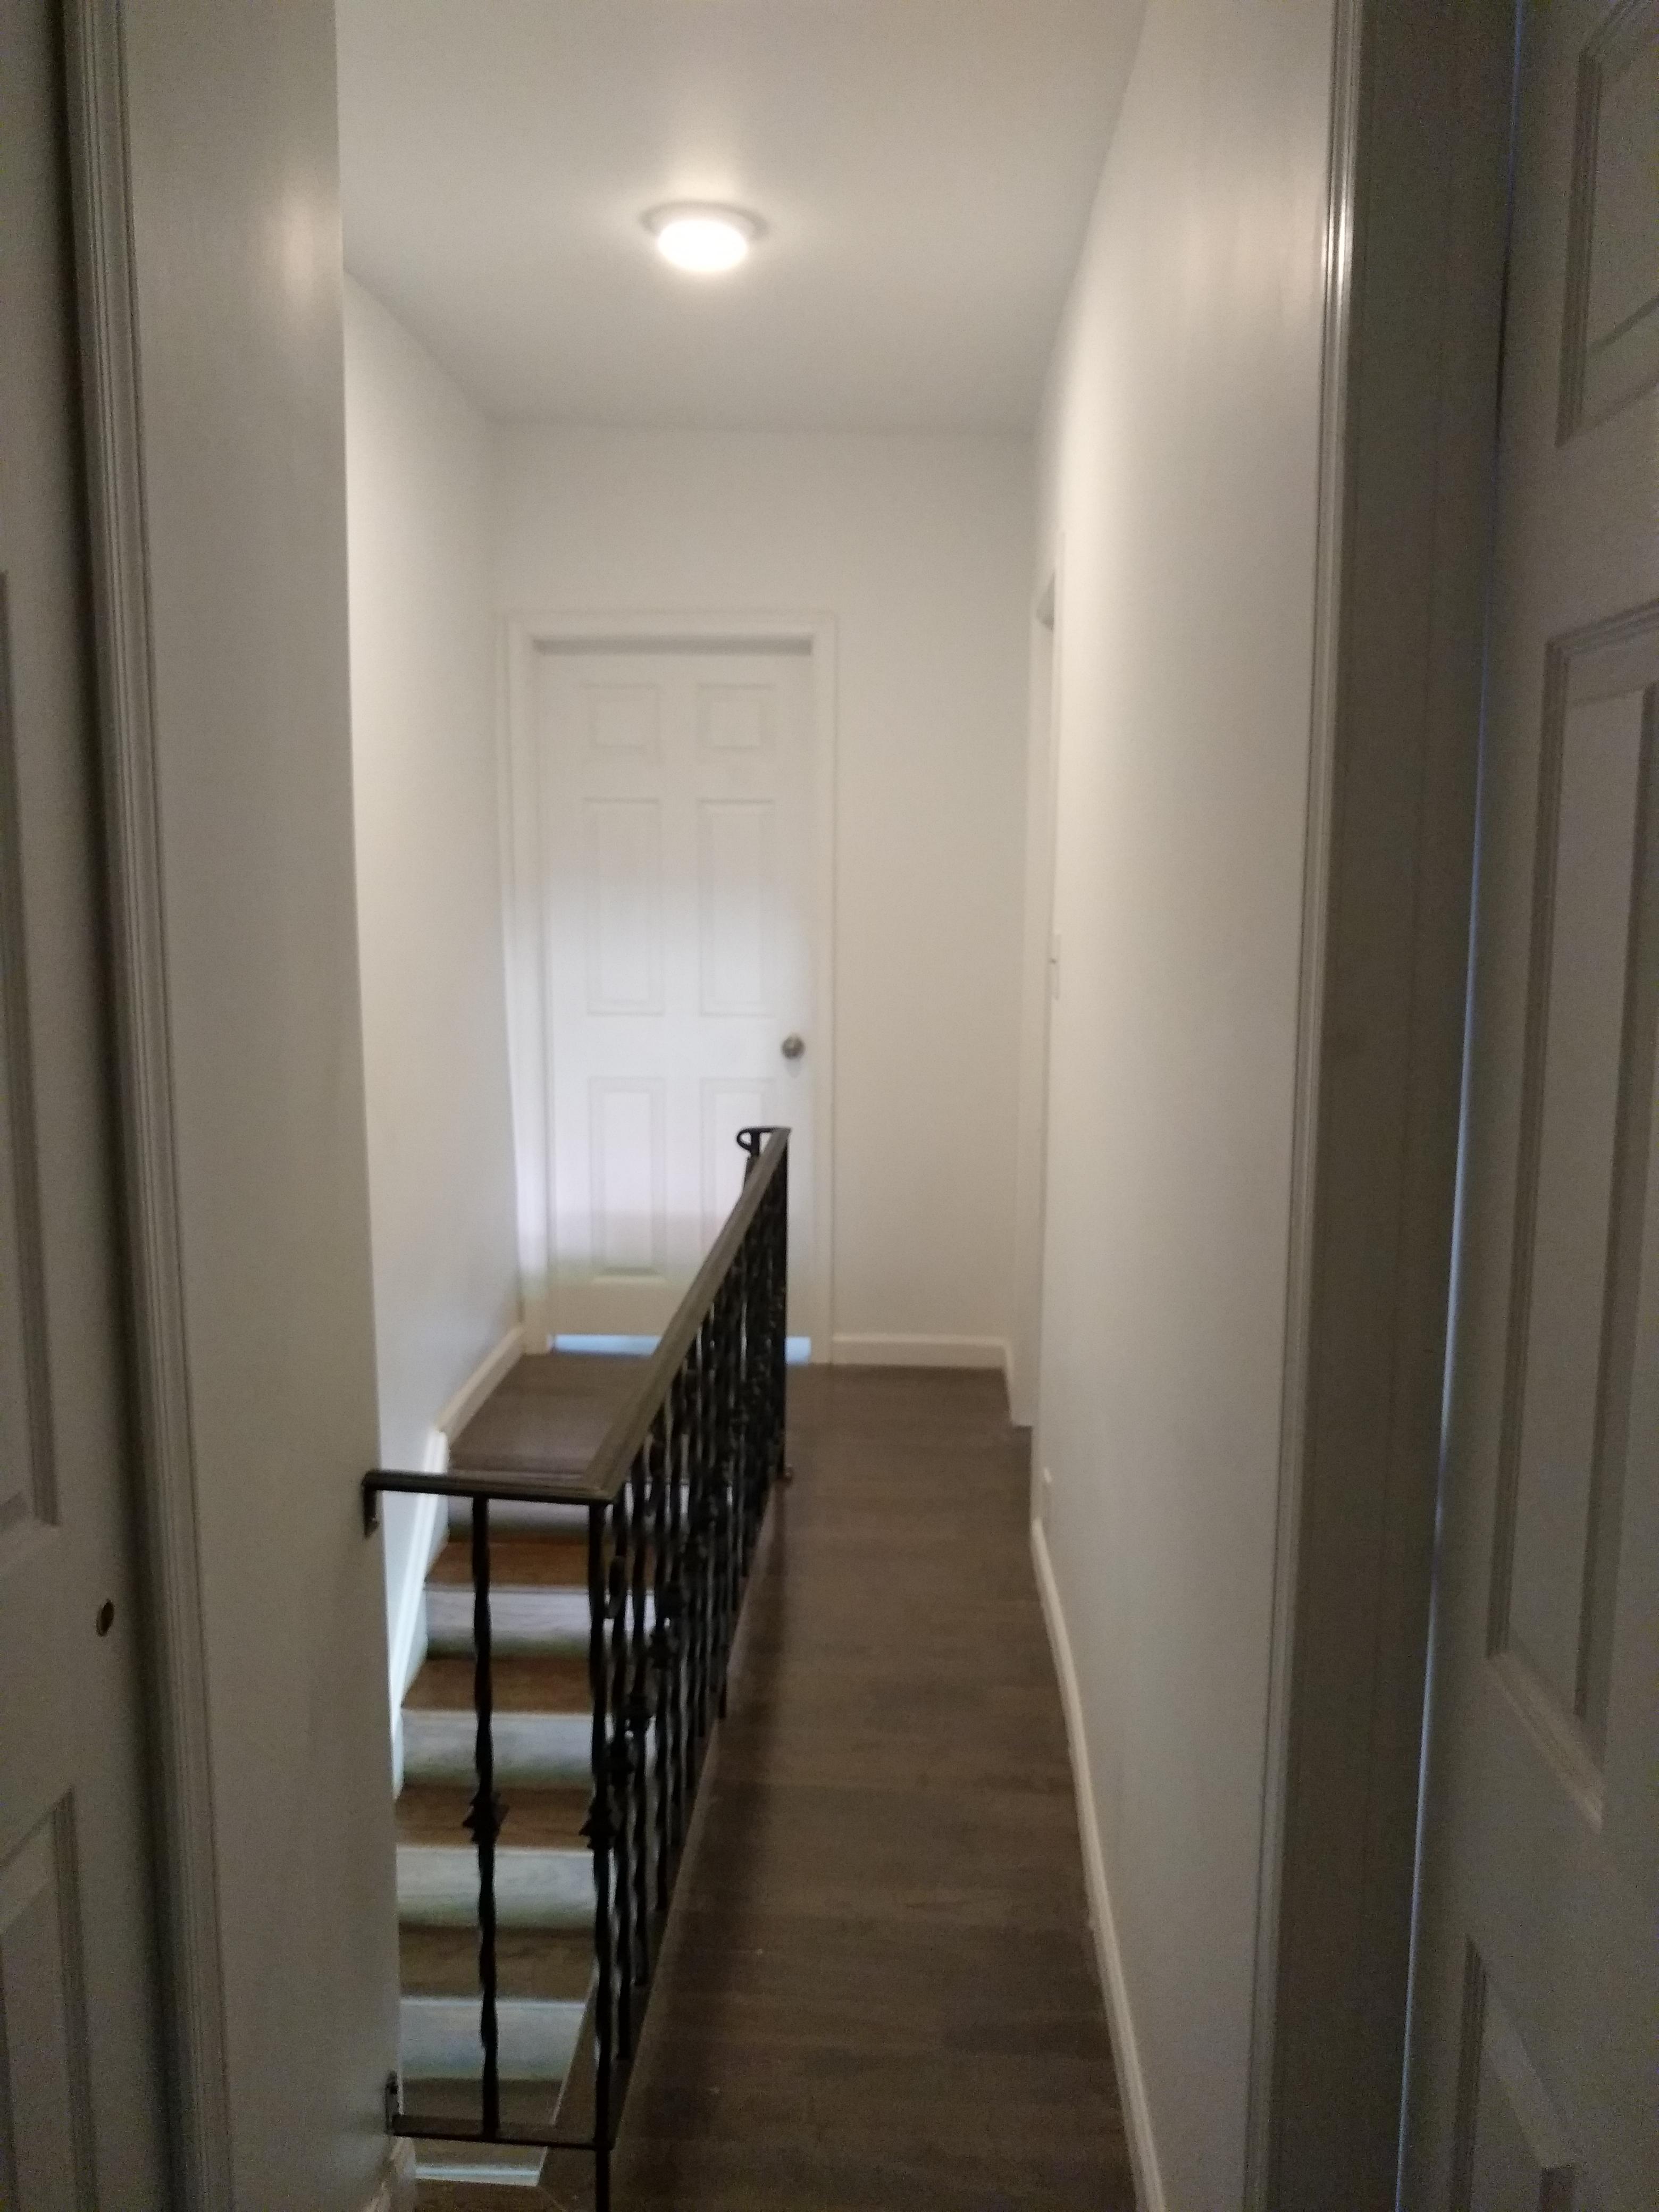 2nd fl. hallway2